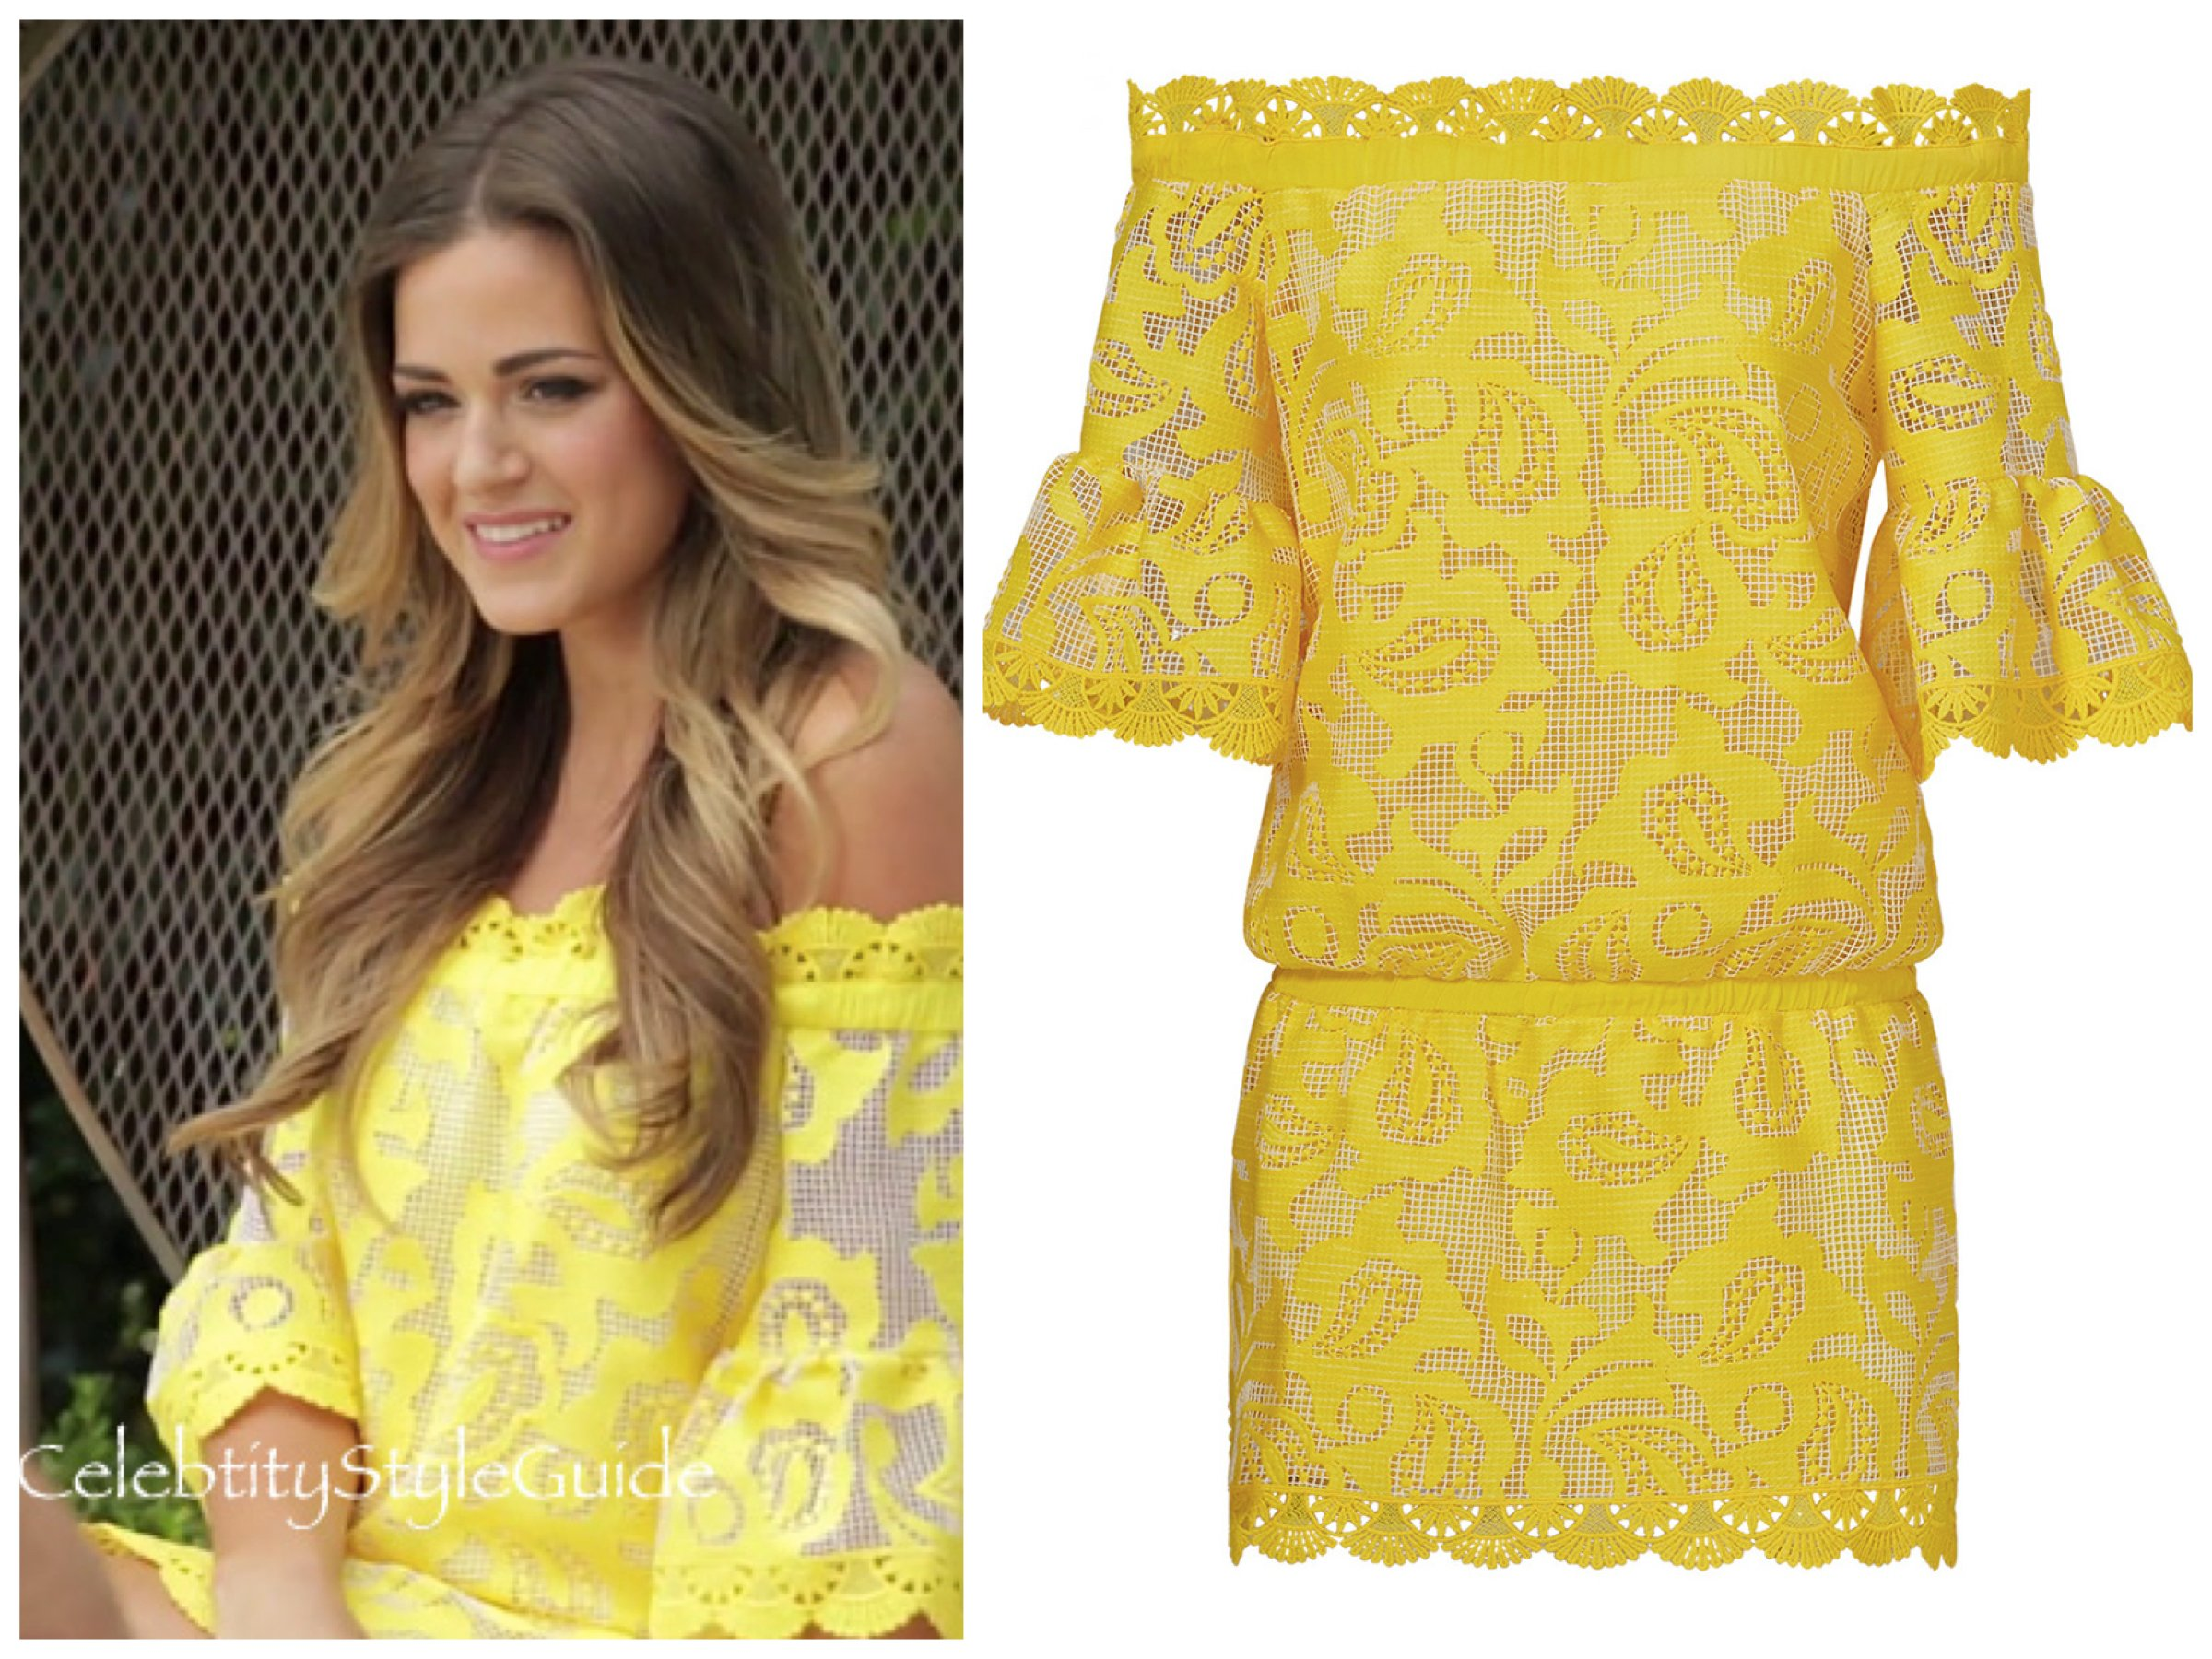 Bachelorette JoJo Fletcher in Alexis Yellow Lace Kit Dress, JoJo Fletcher's Bachelorette Looks